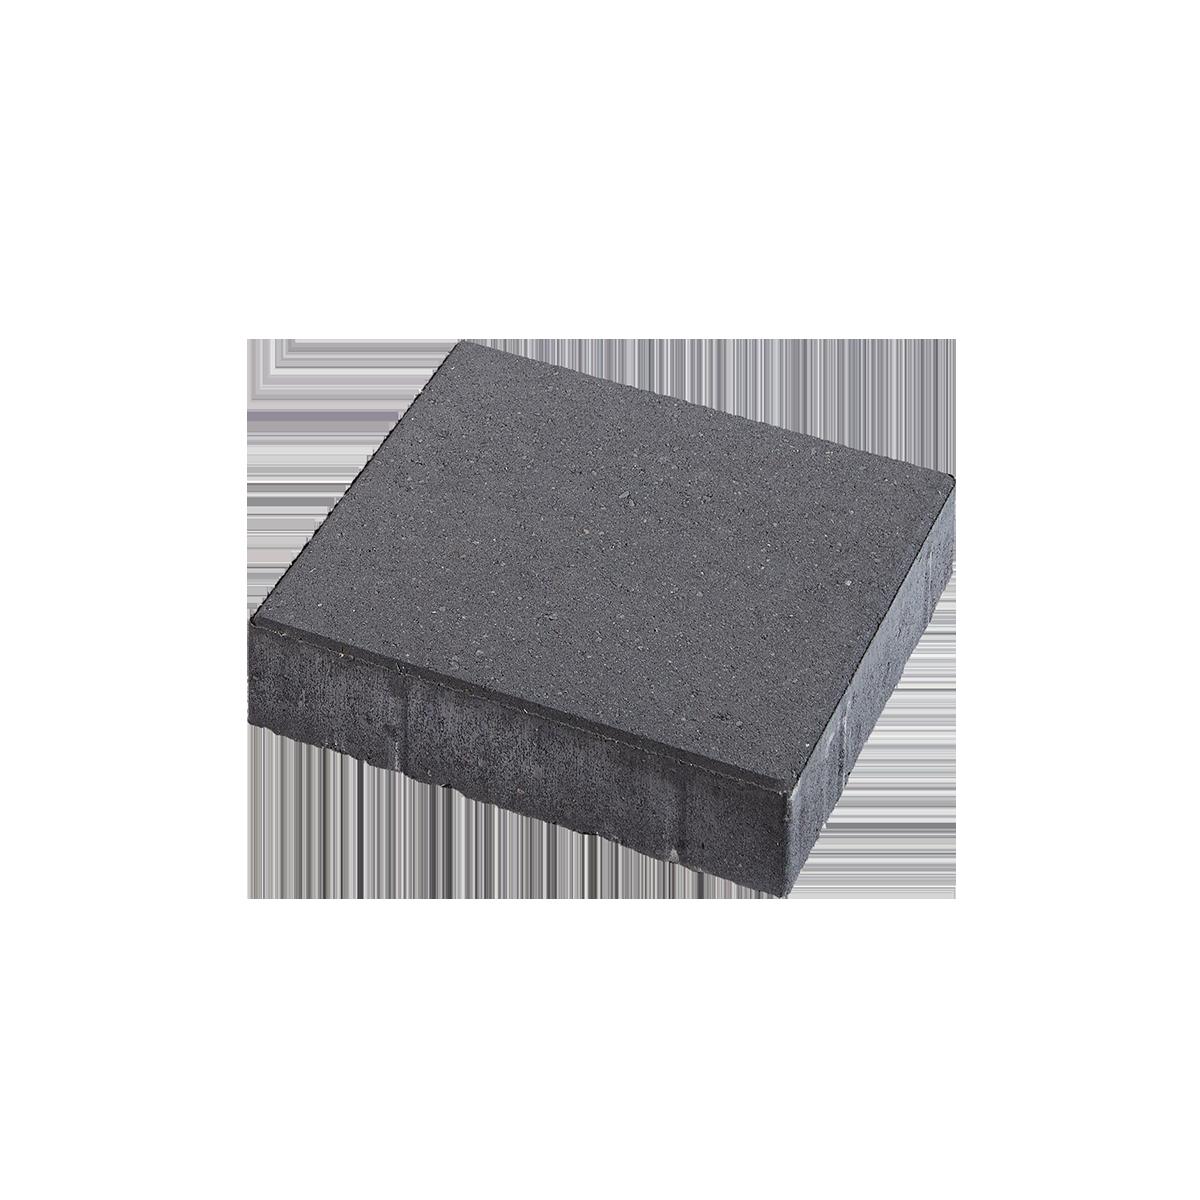 Fliser 30x30x6 cm Sort/Antracit